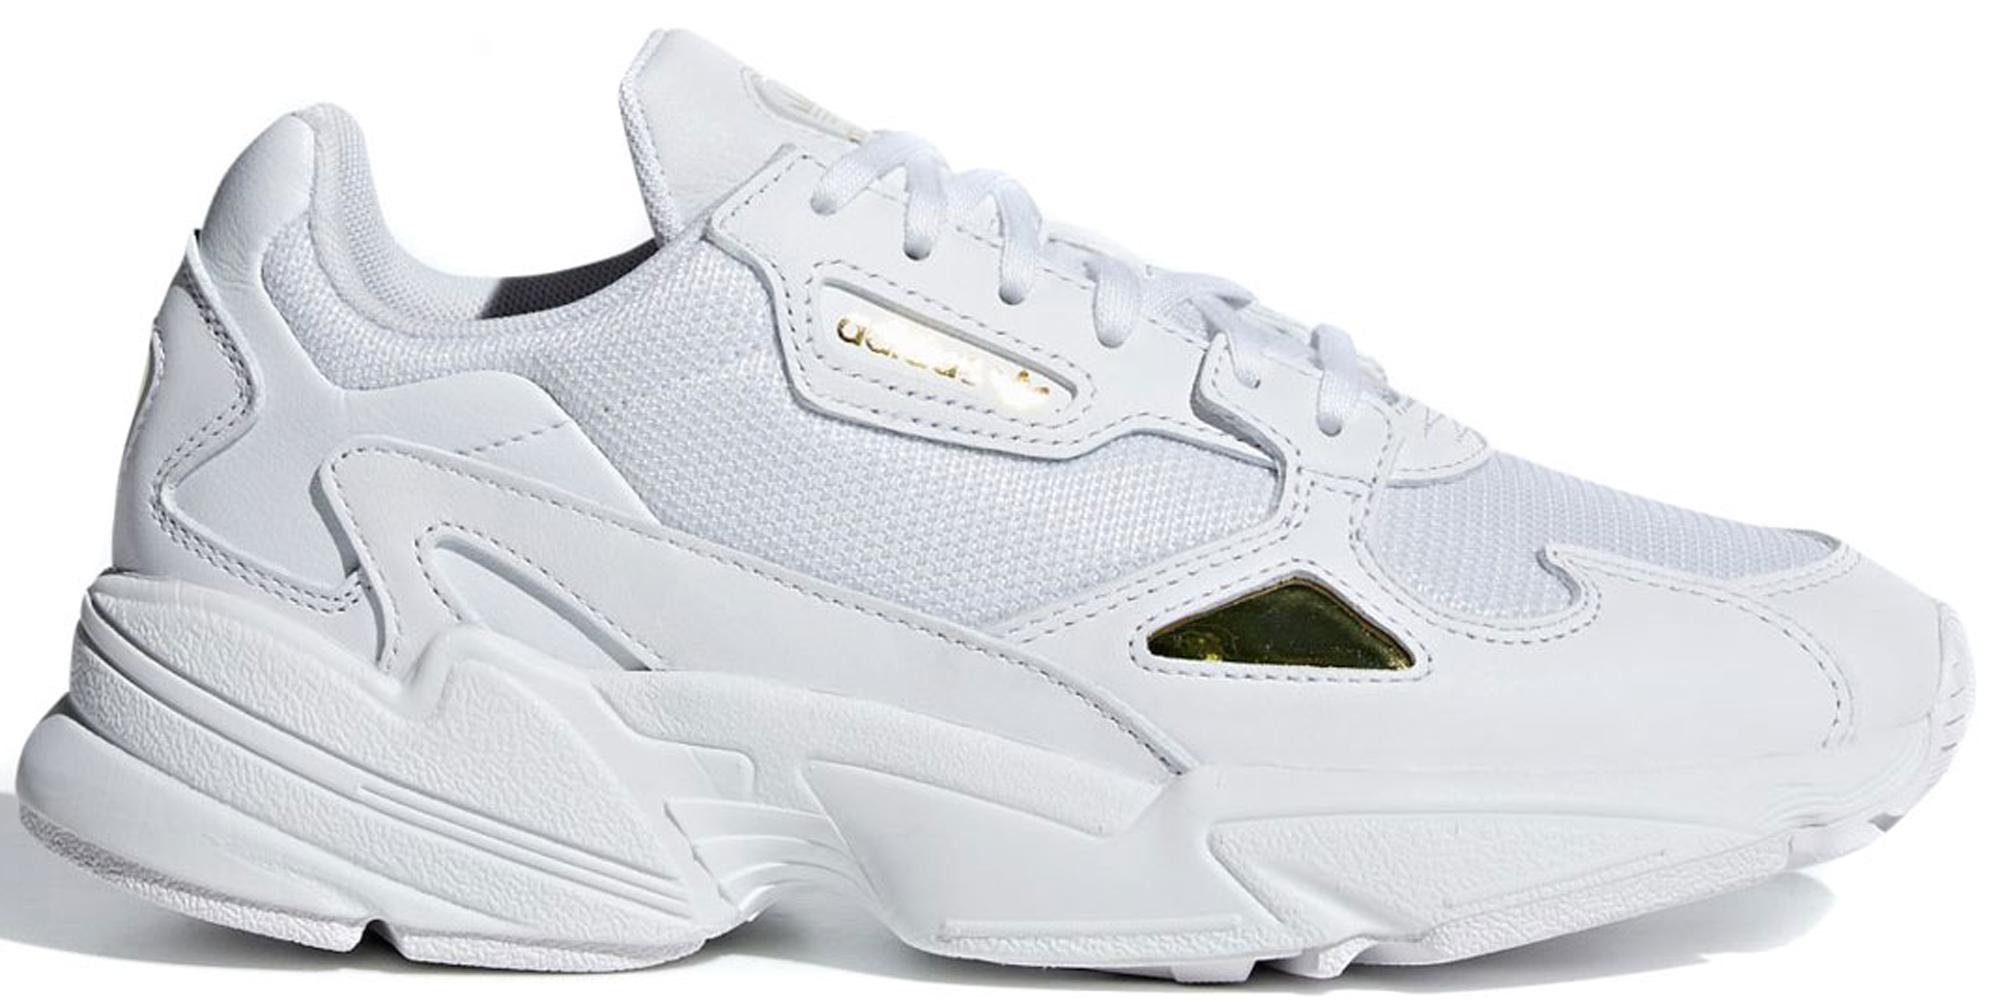 adidas Falcon Cloud White Gold Metallic